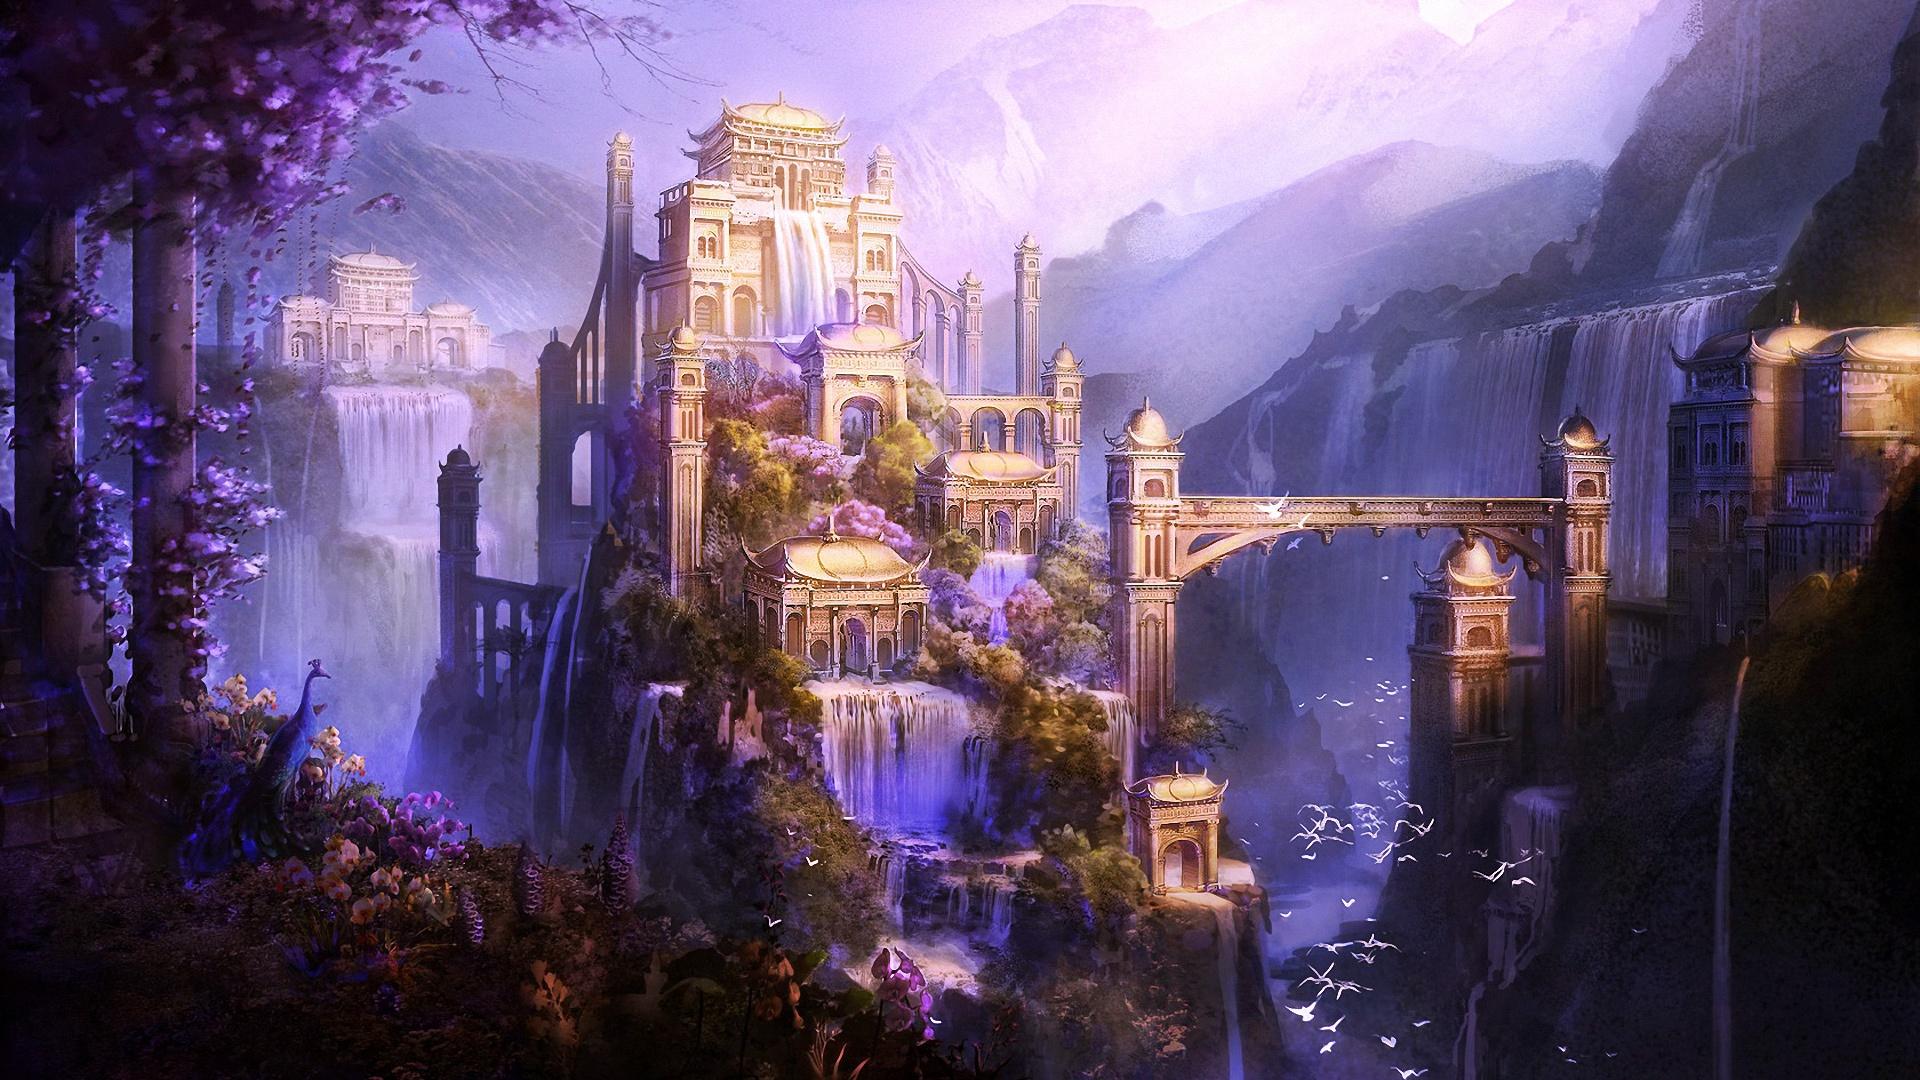 Fantasy Landsсape free download wallpaper